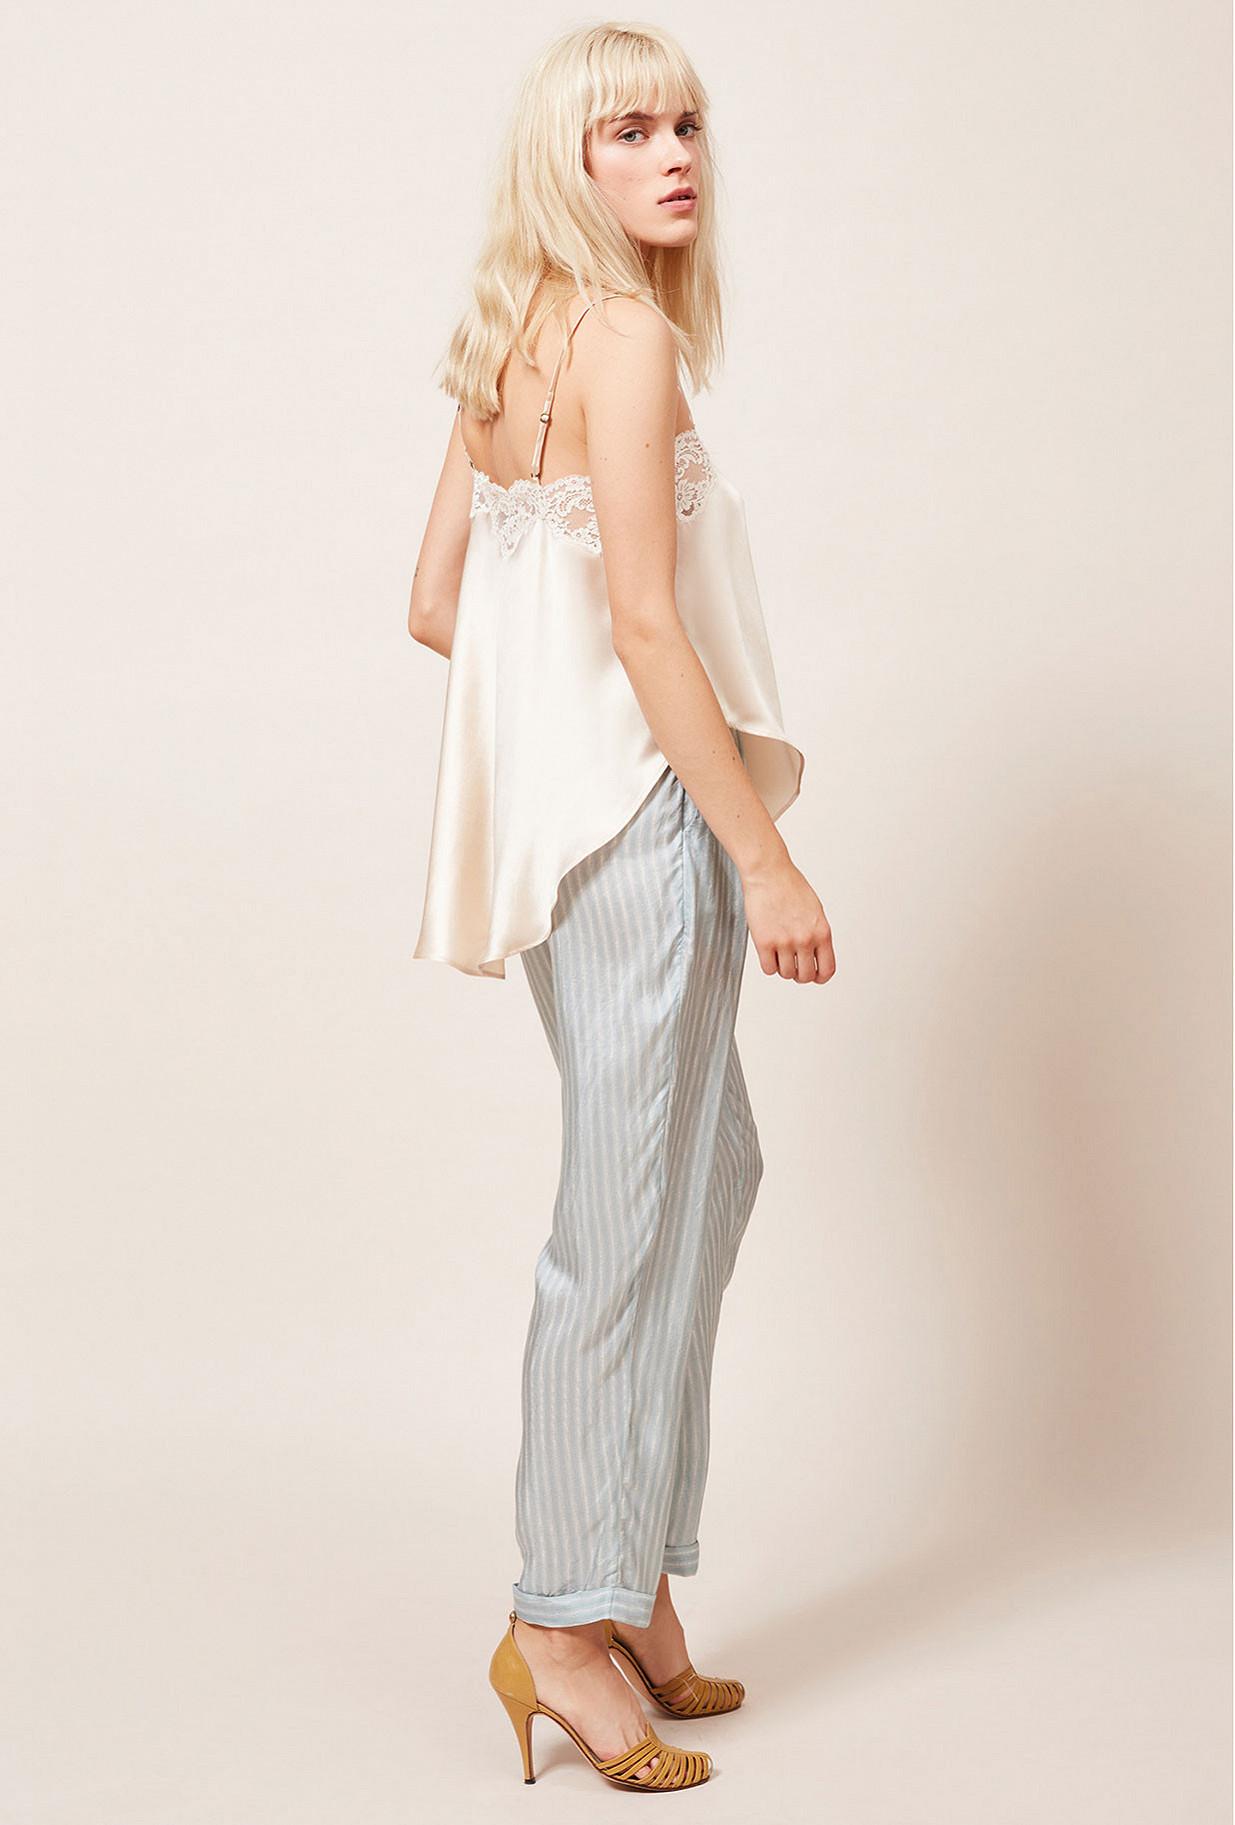 Ivory  Top  Geai Mes demoiselles fashion clothes designer Paris